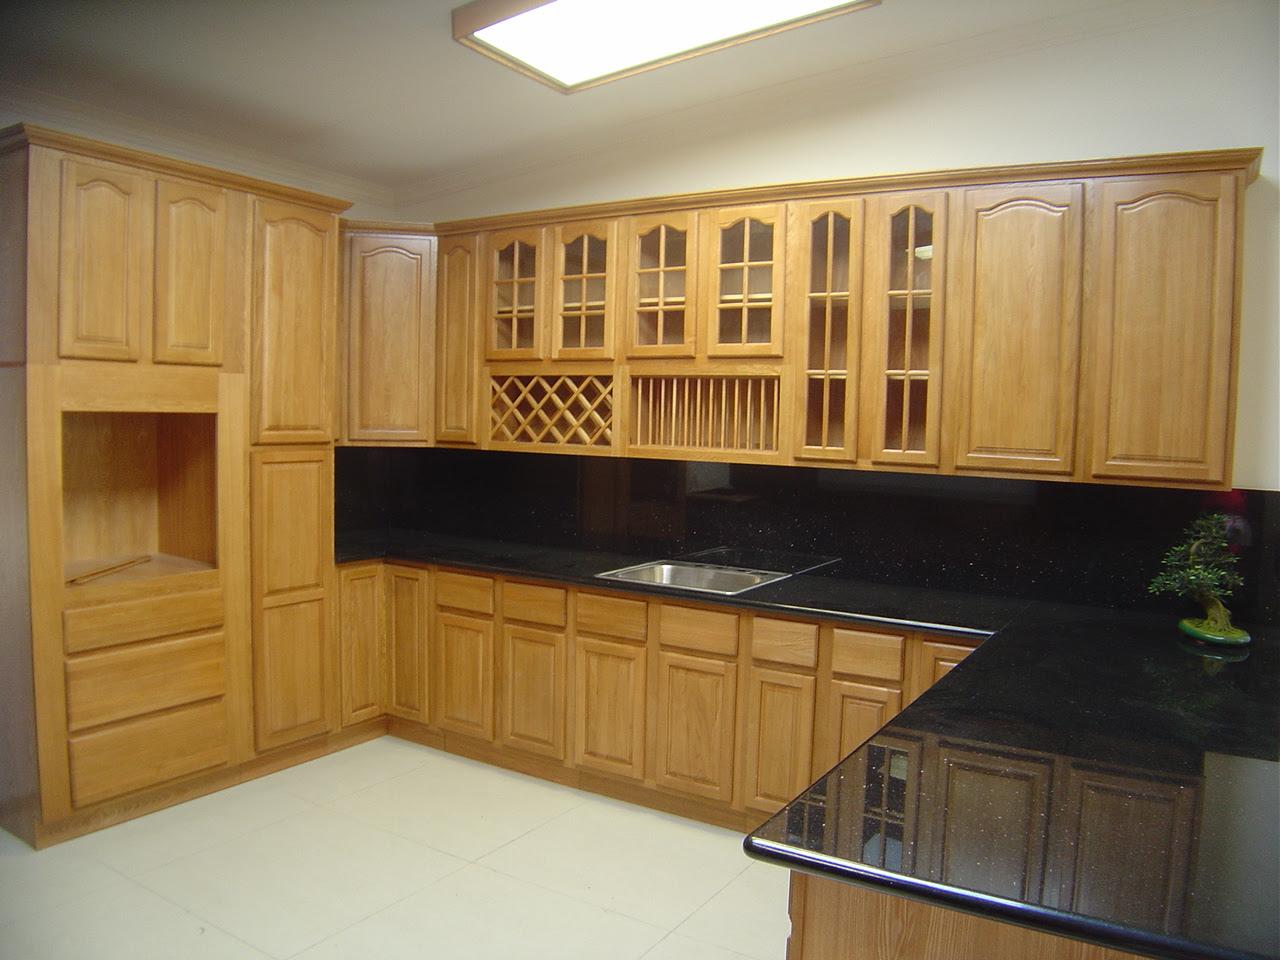 Kitchen Cabinets For premium oak kitchen cabinets